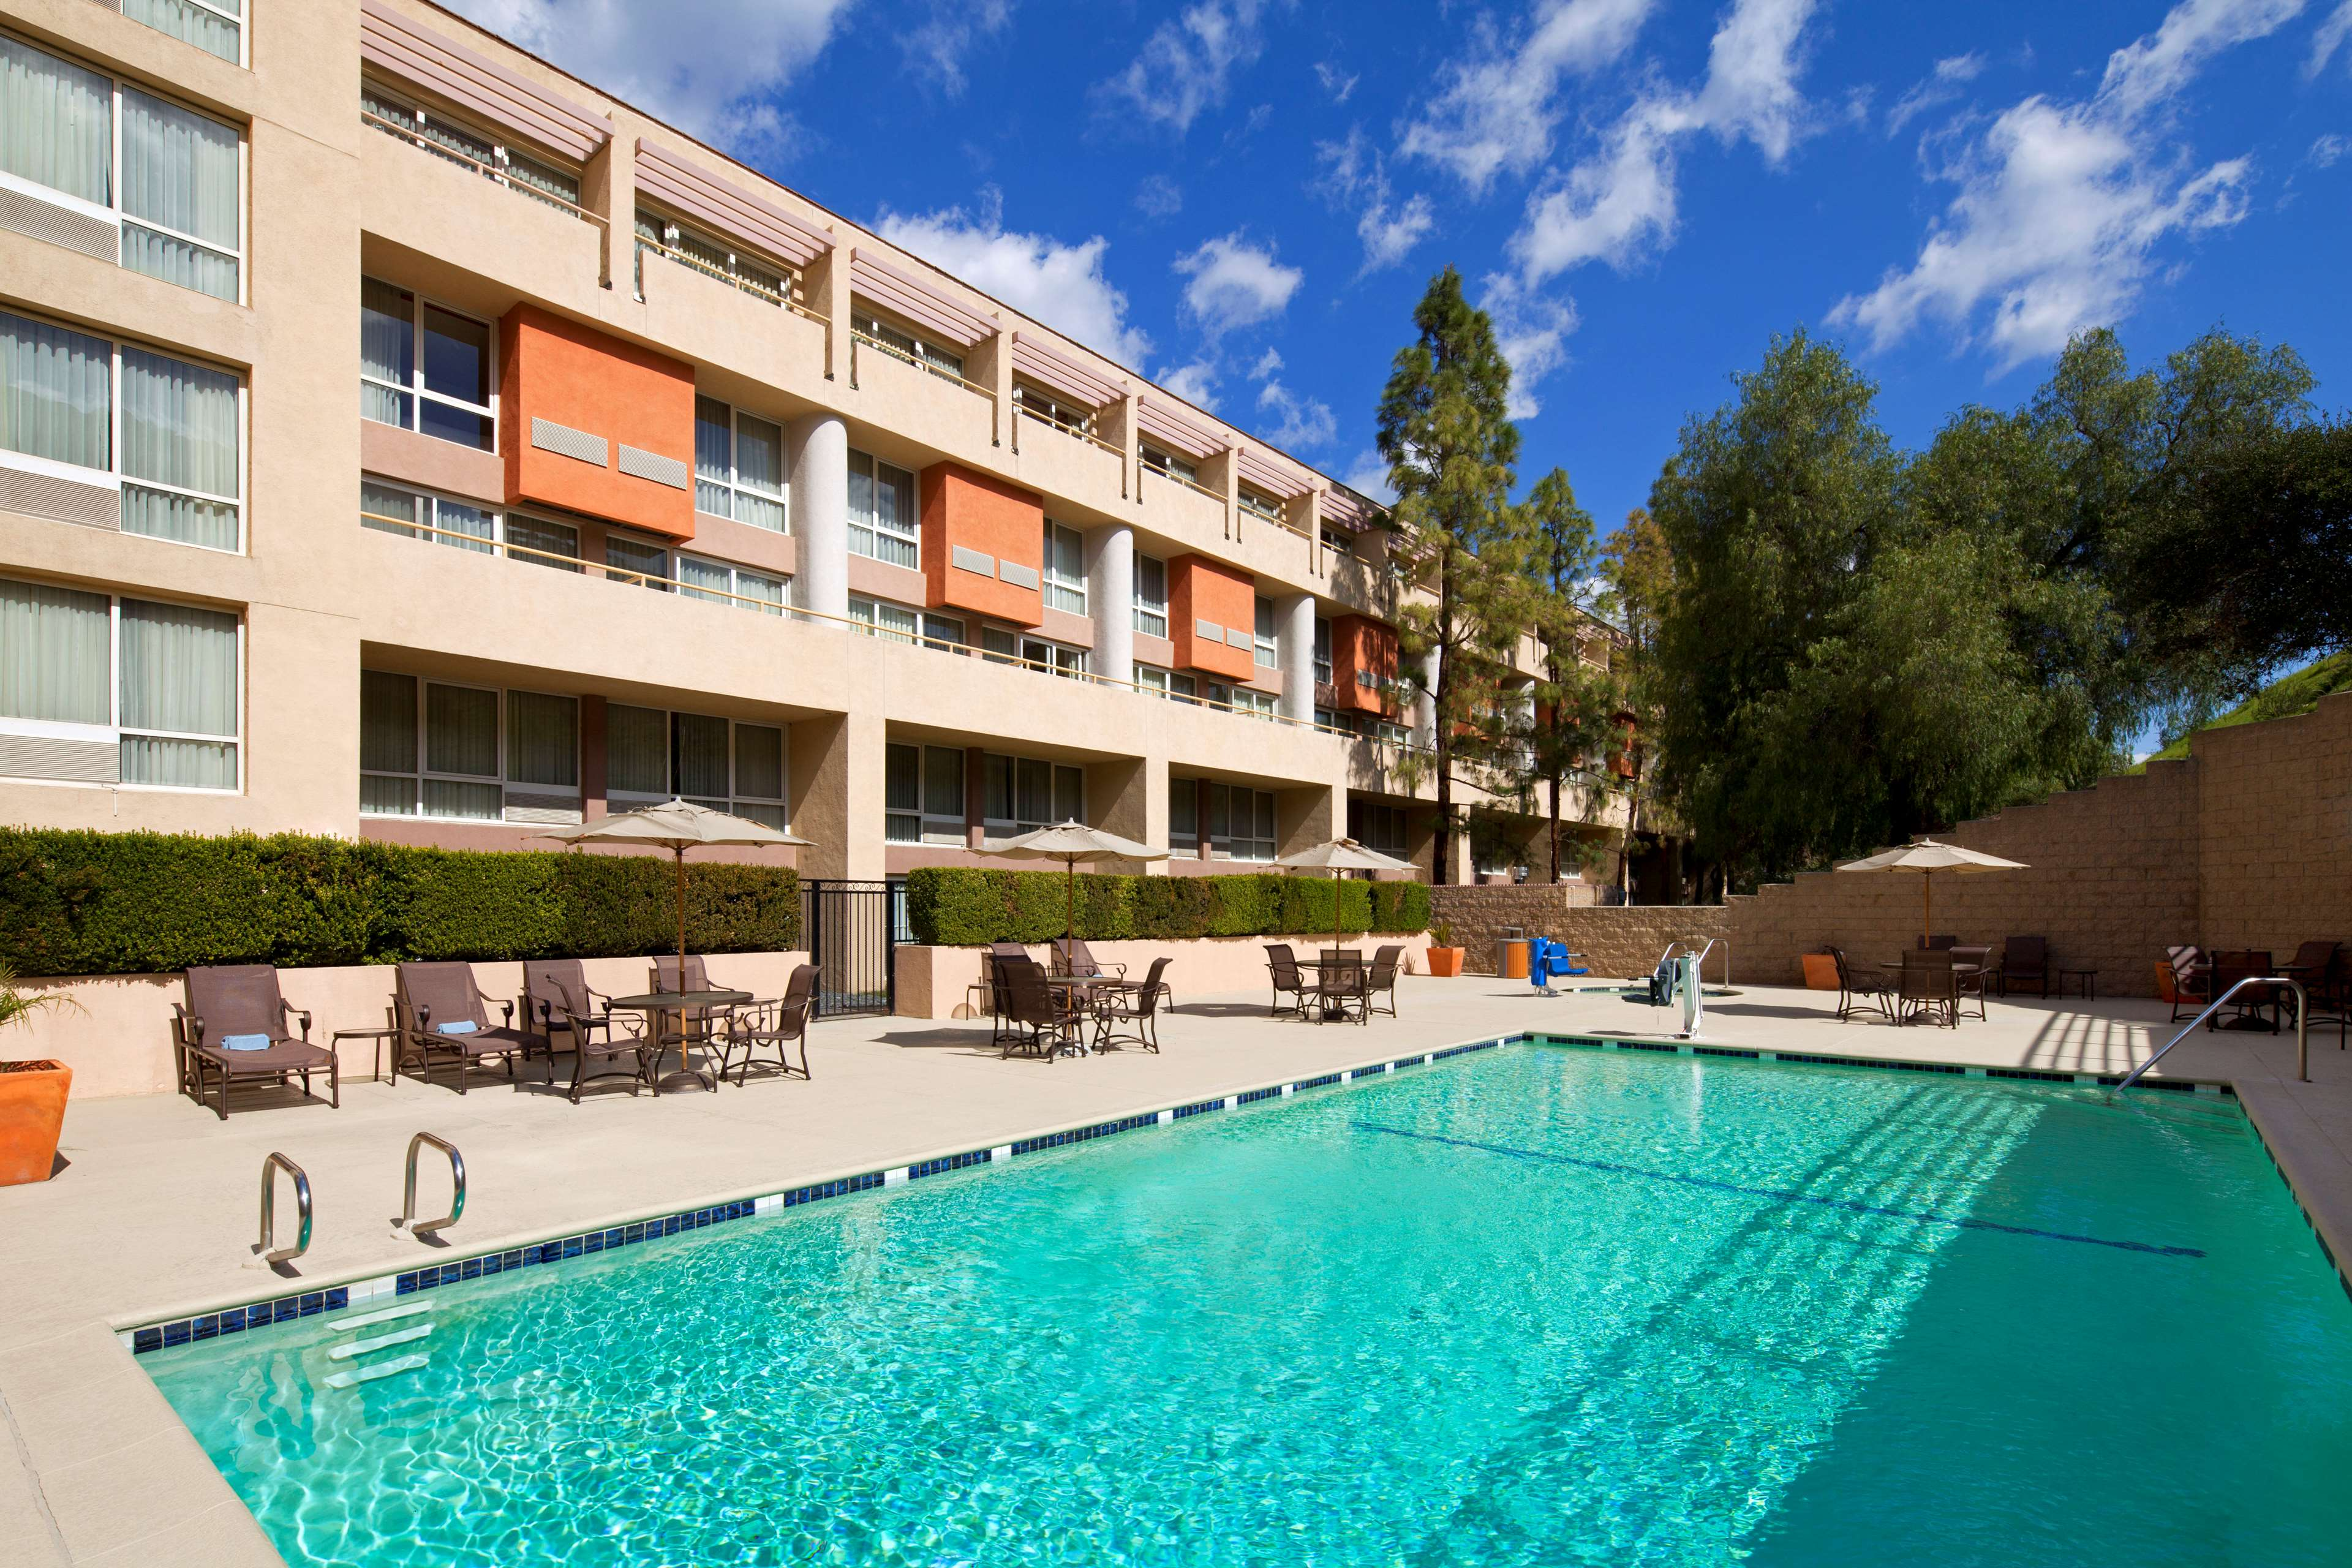 Motels Agoura Hills Ca